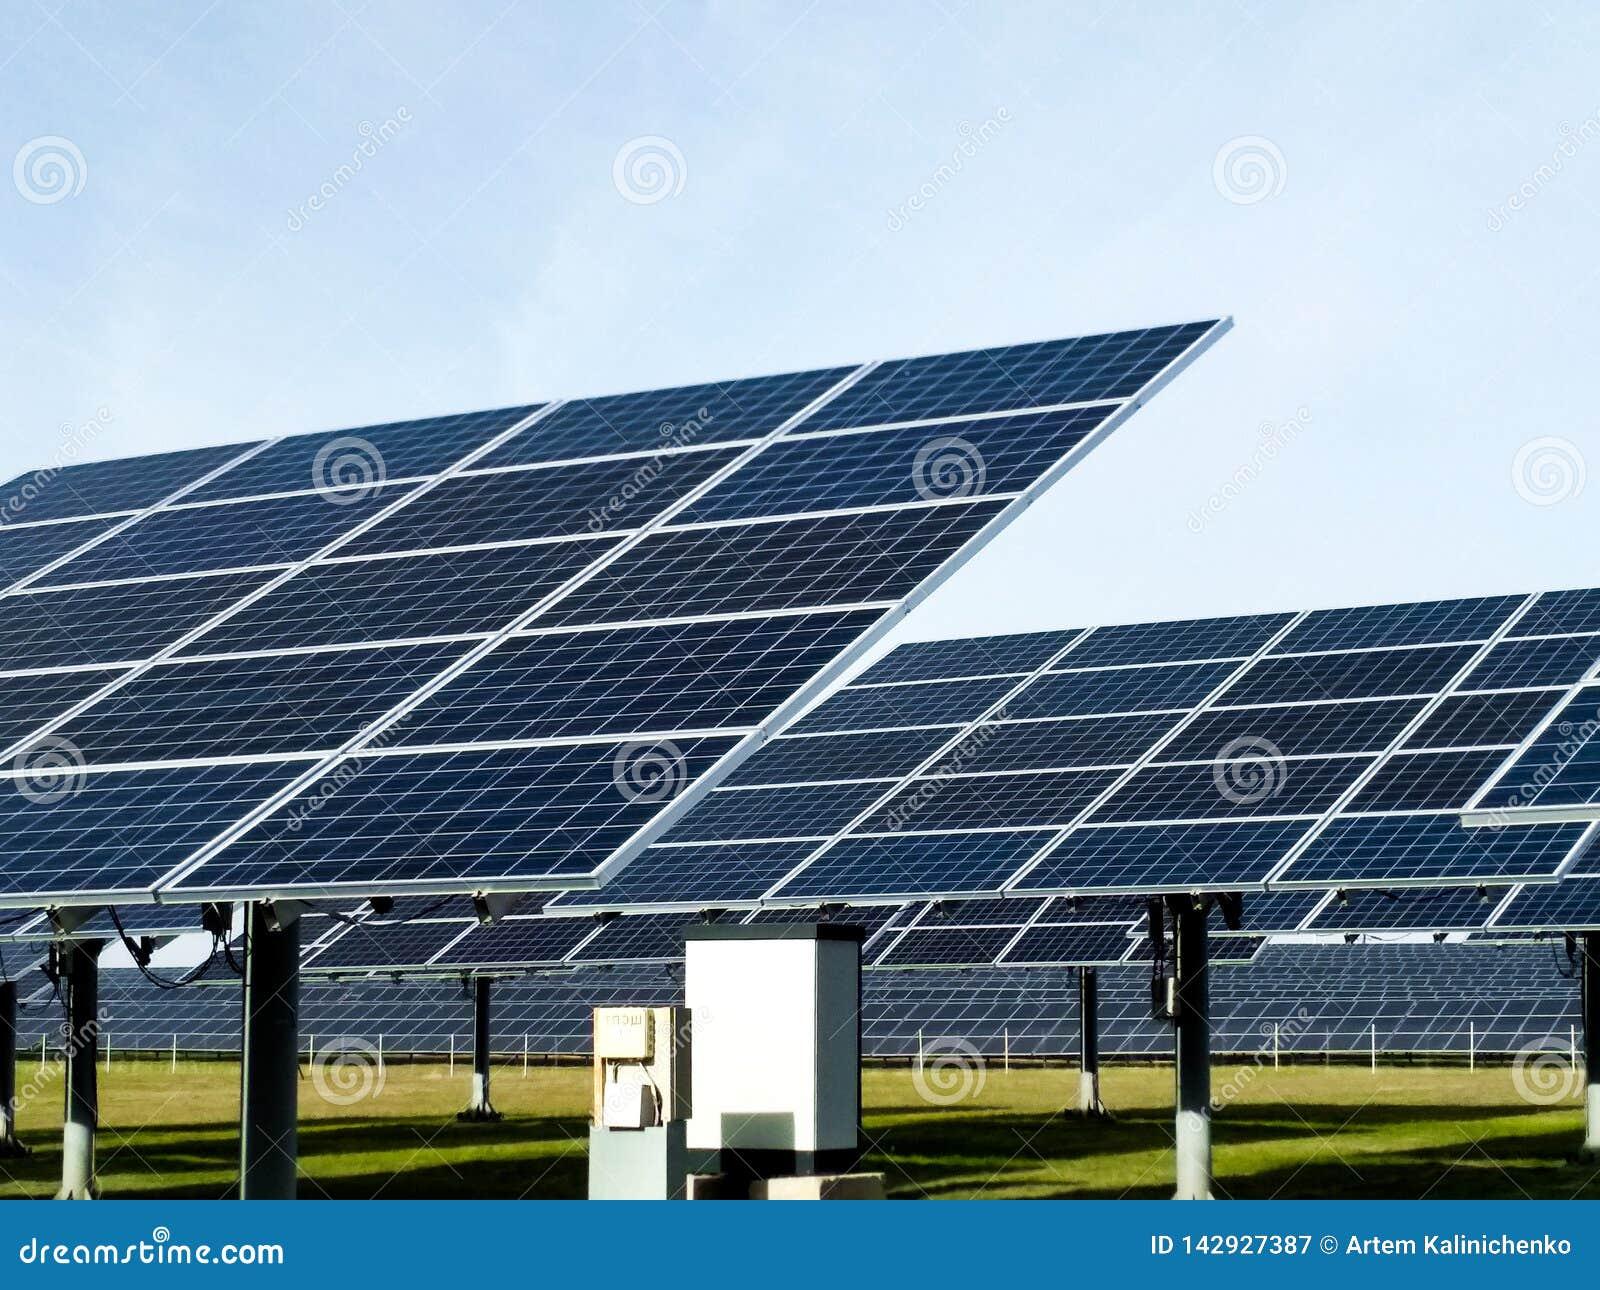 Big solar station on a clear day